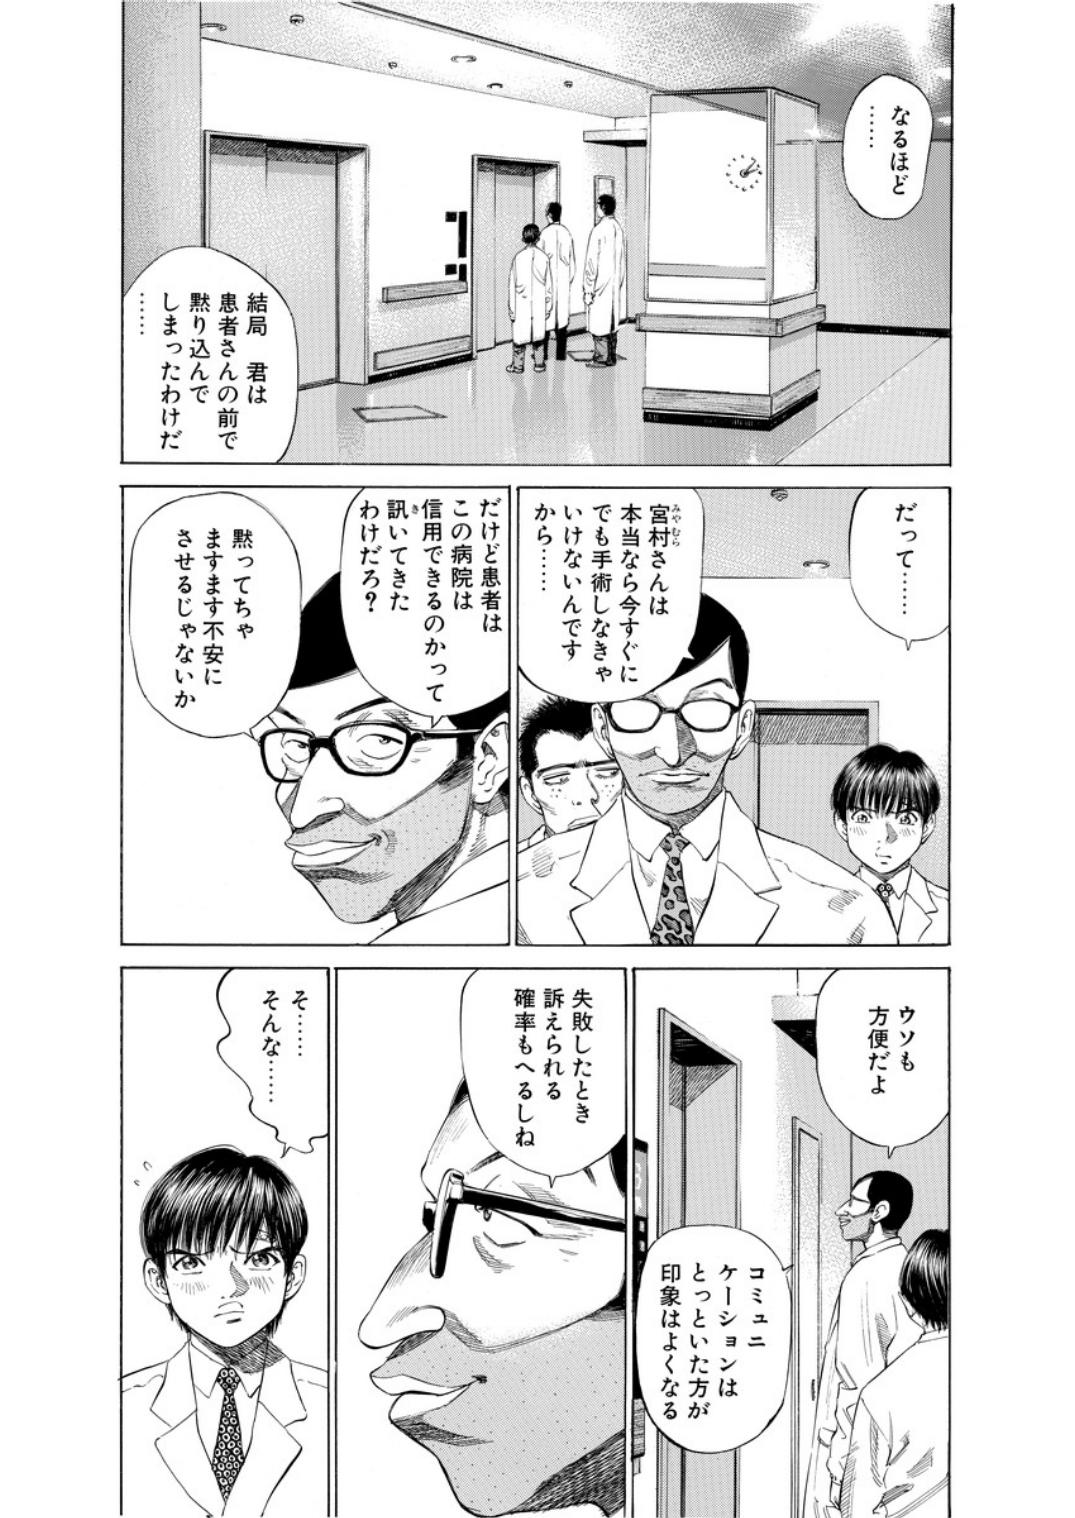 001bj_page-0192.jpg